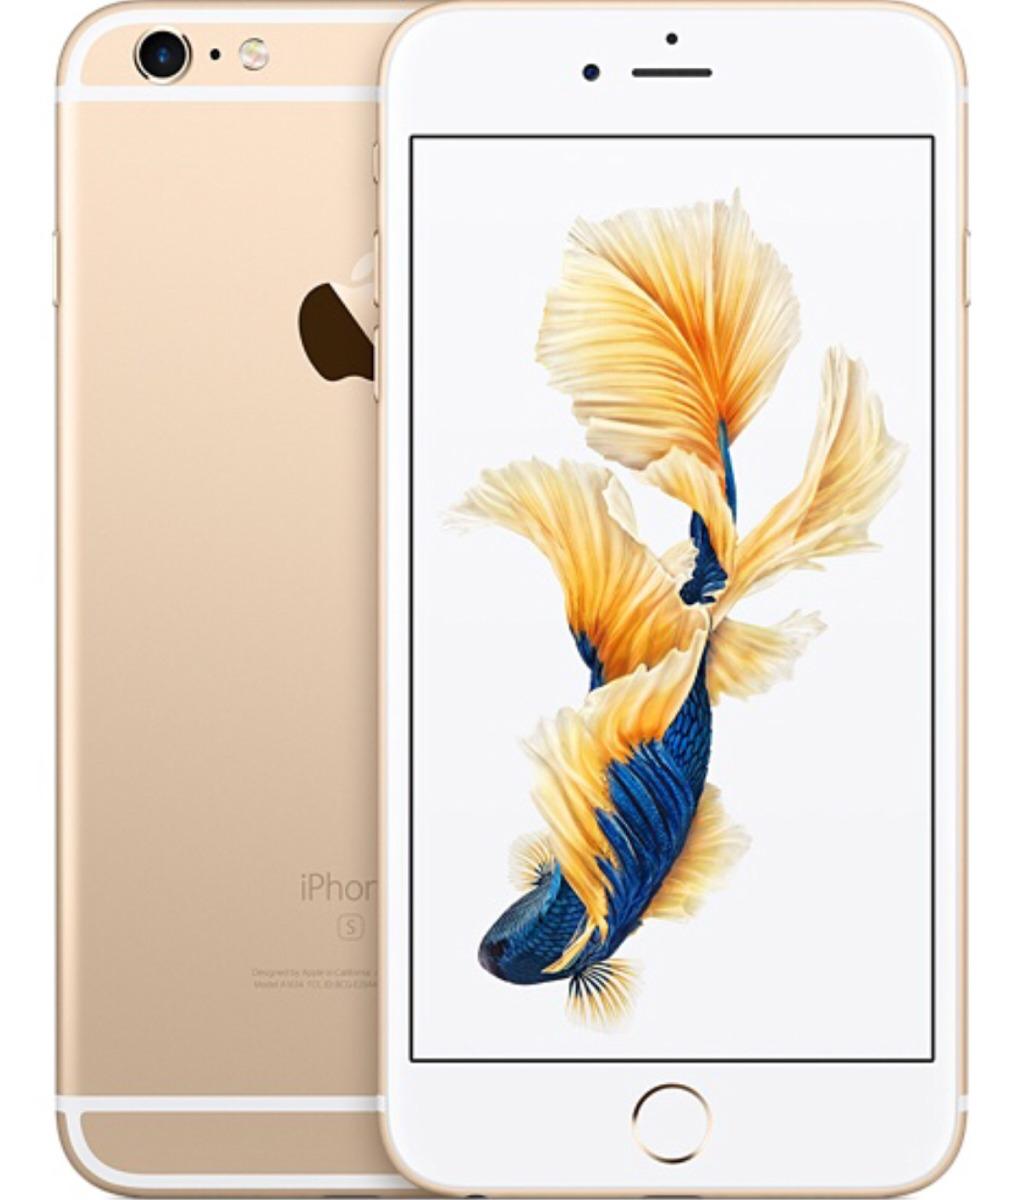 2889a6d46ee iPhone 6s Plus 128gb Vitrine Garantia 3 Meses - R$ 2.389,00 em ...